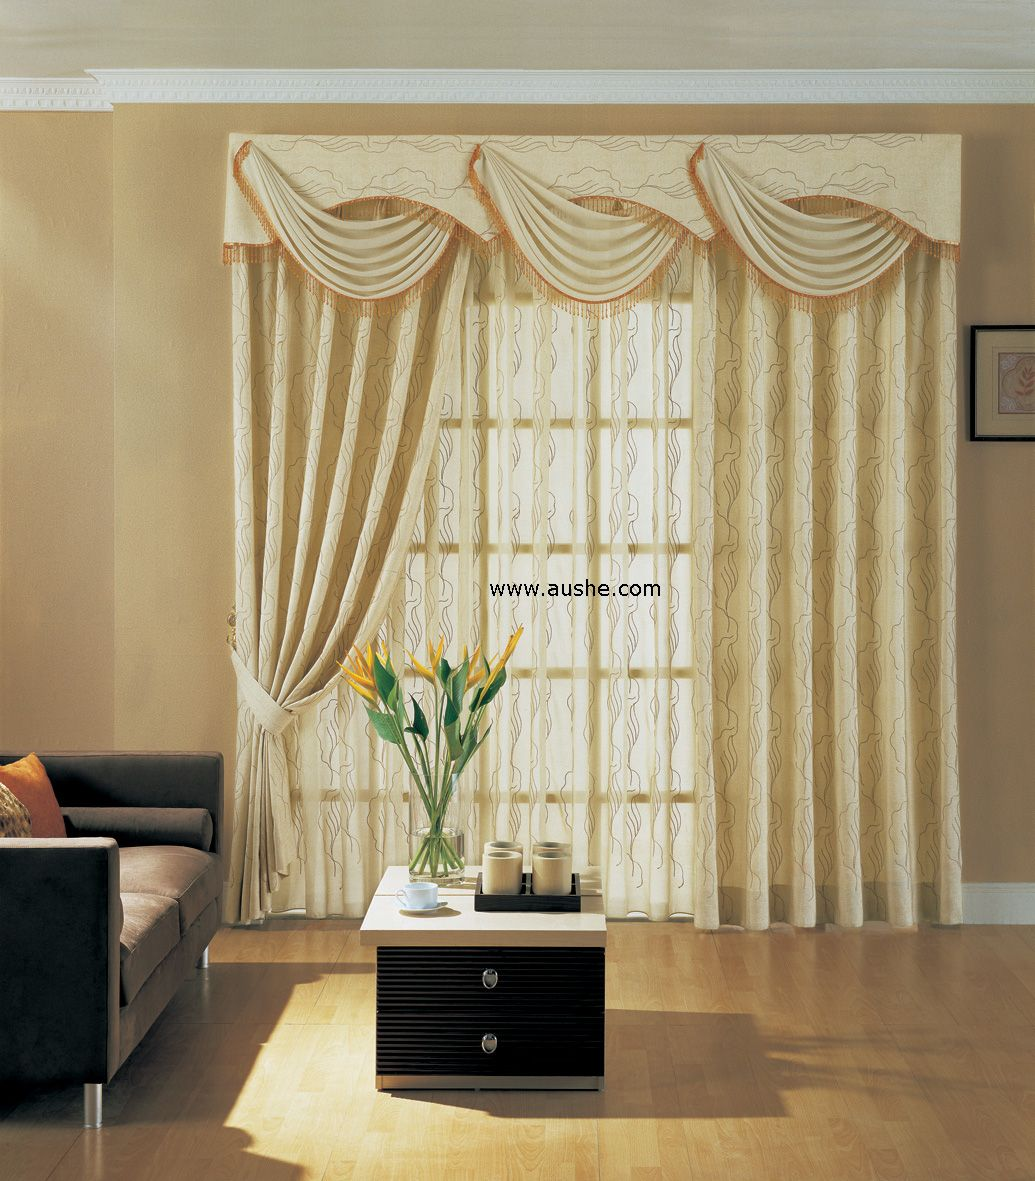 Curtains And Valances Curtain Designs Curtain Valances Curtain Drapery Curtain Drapes